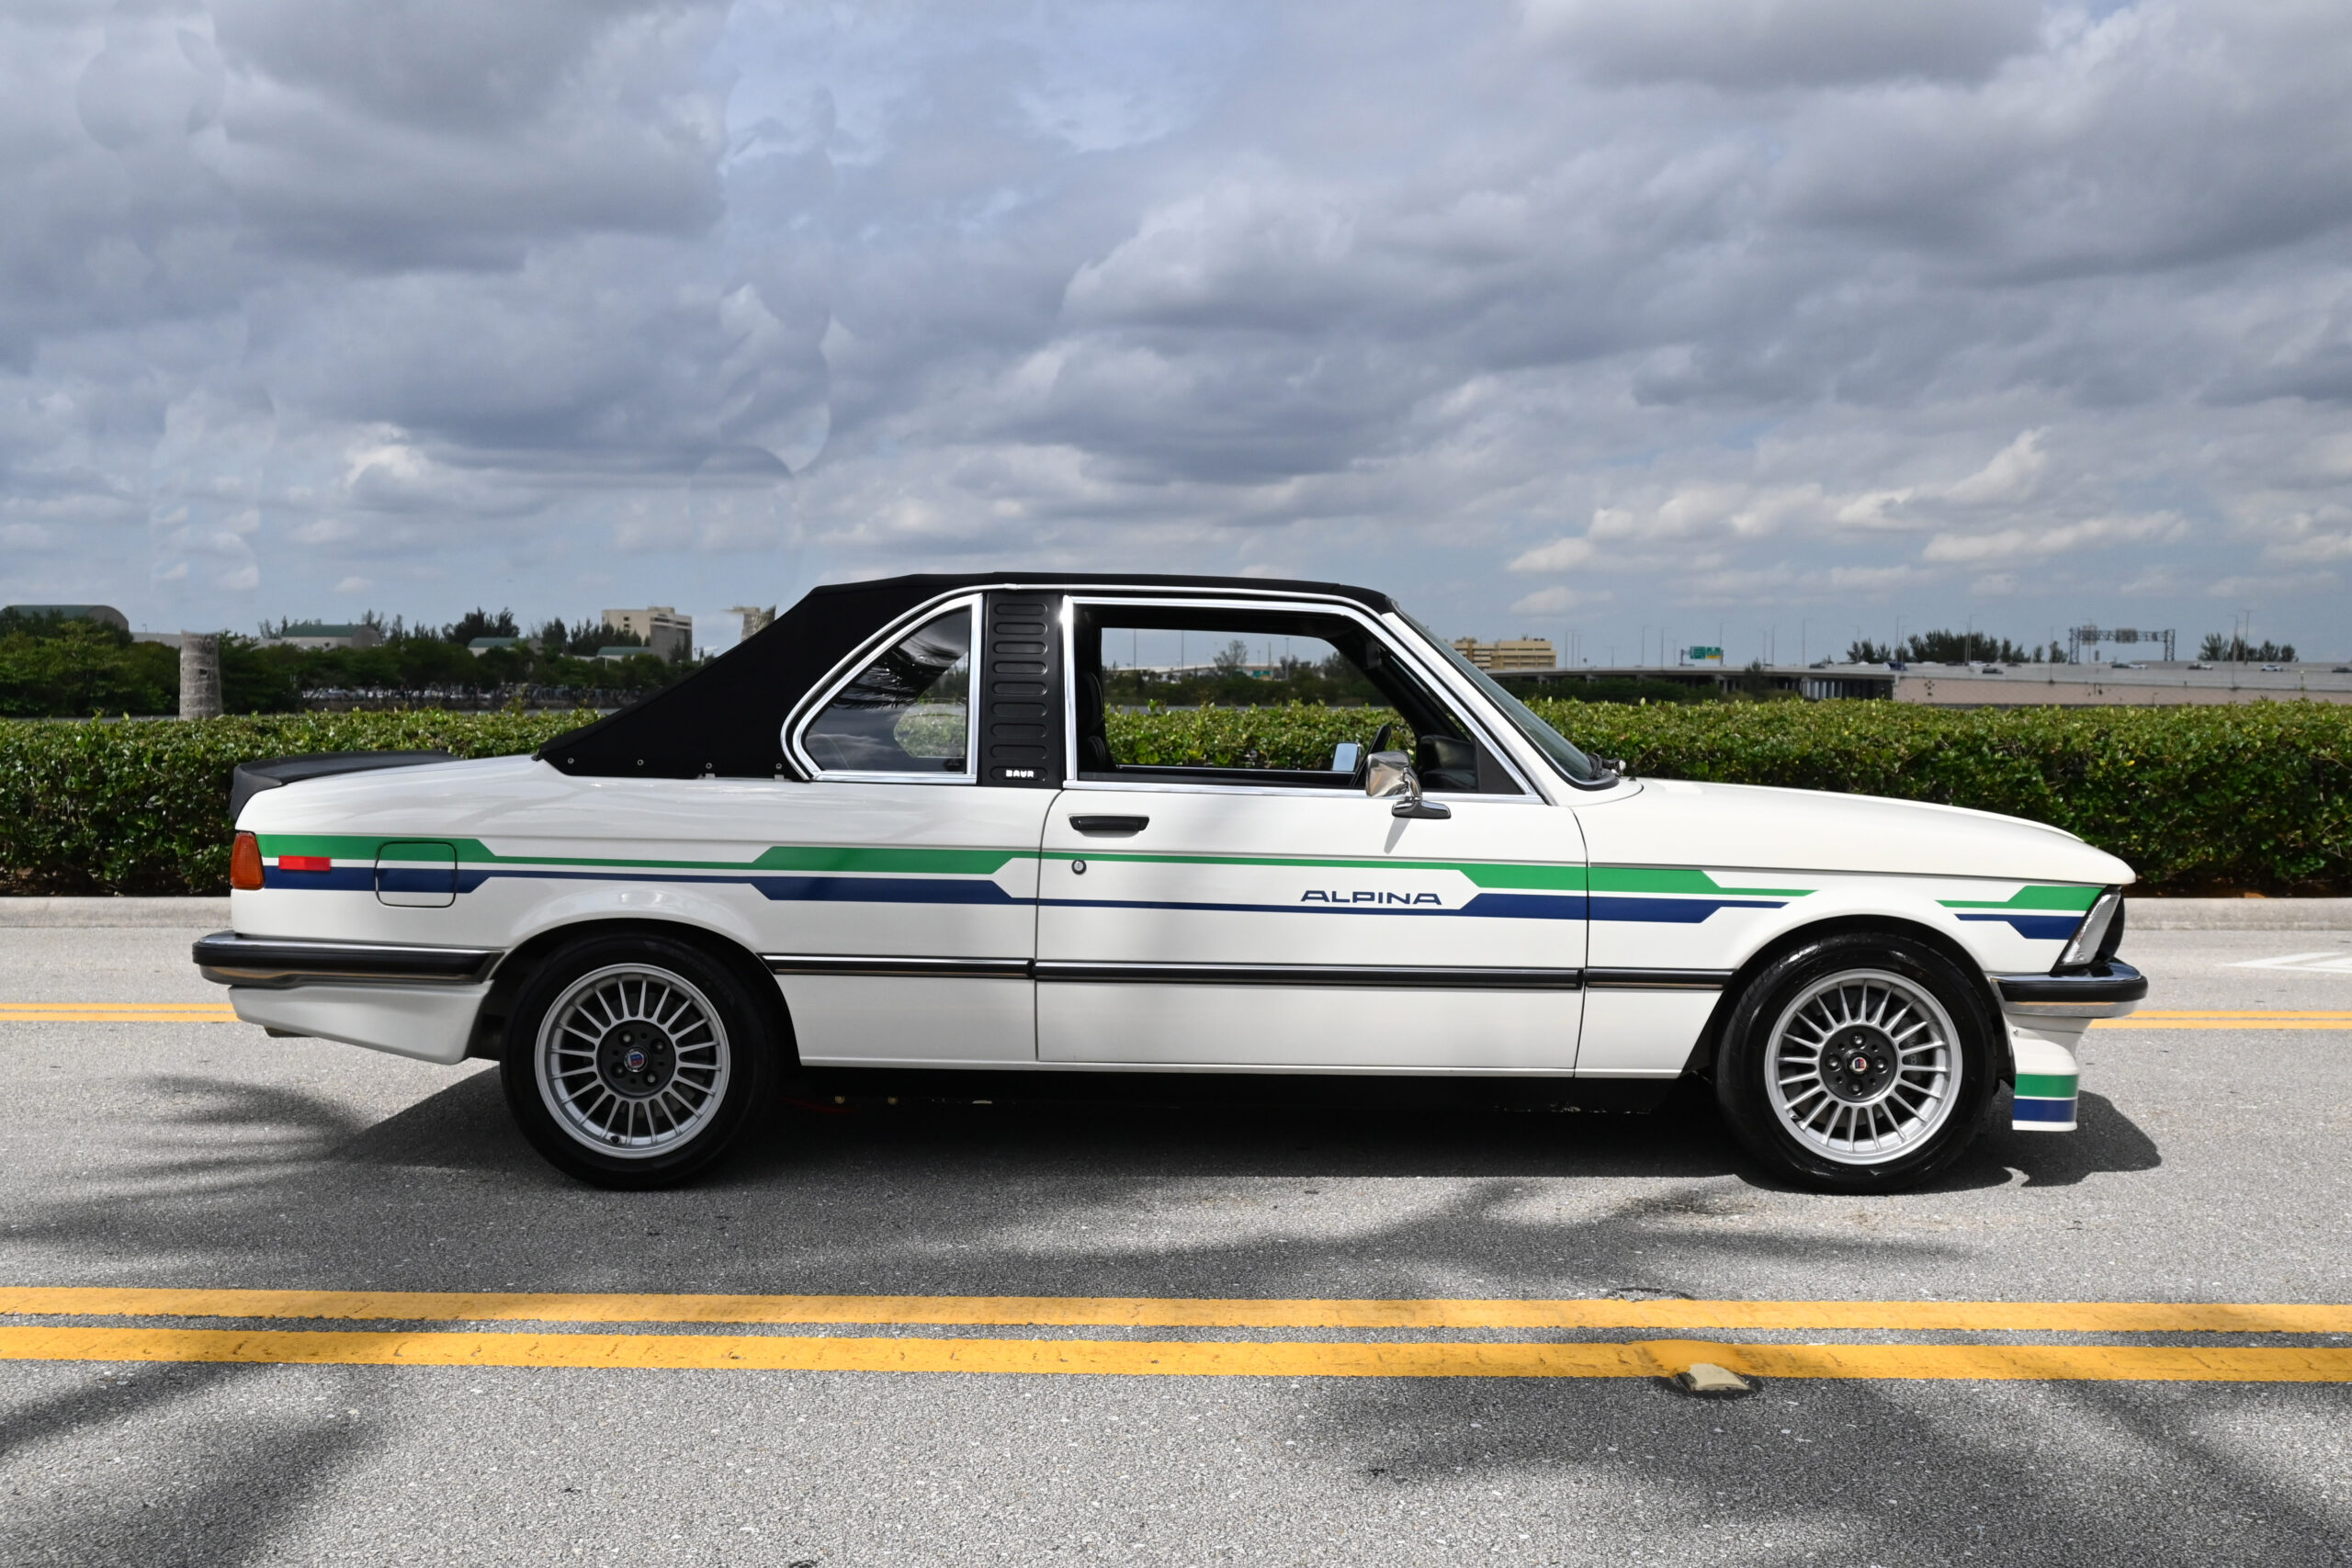 1979 BMW 320 Baur.  Rare authentic Baur coach work, Alpina upgrades, Schnitzer 2.7 Stroker Engine, Big Brakes incredible build